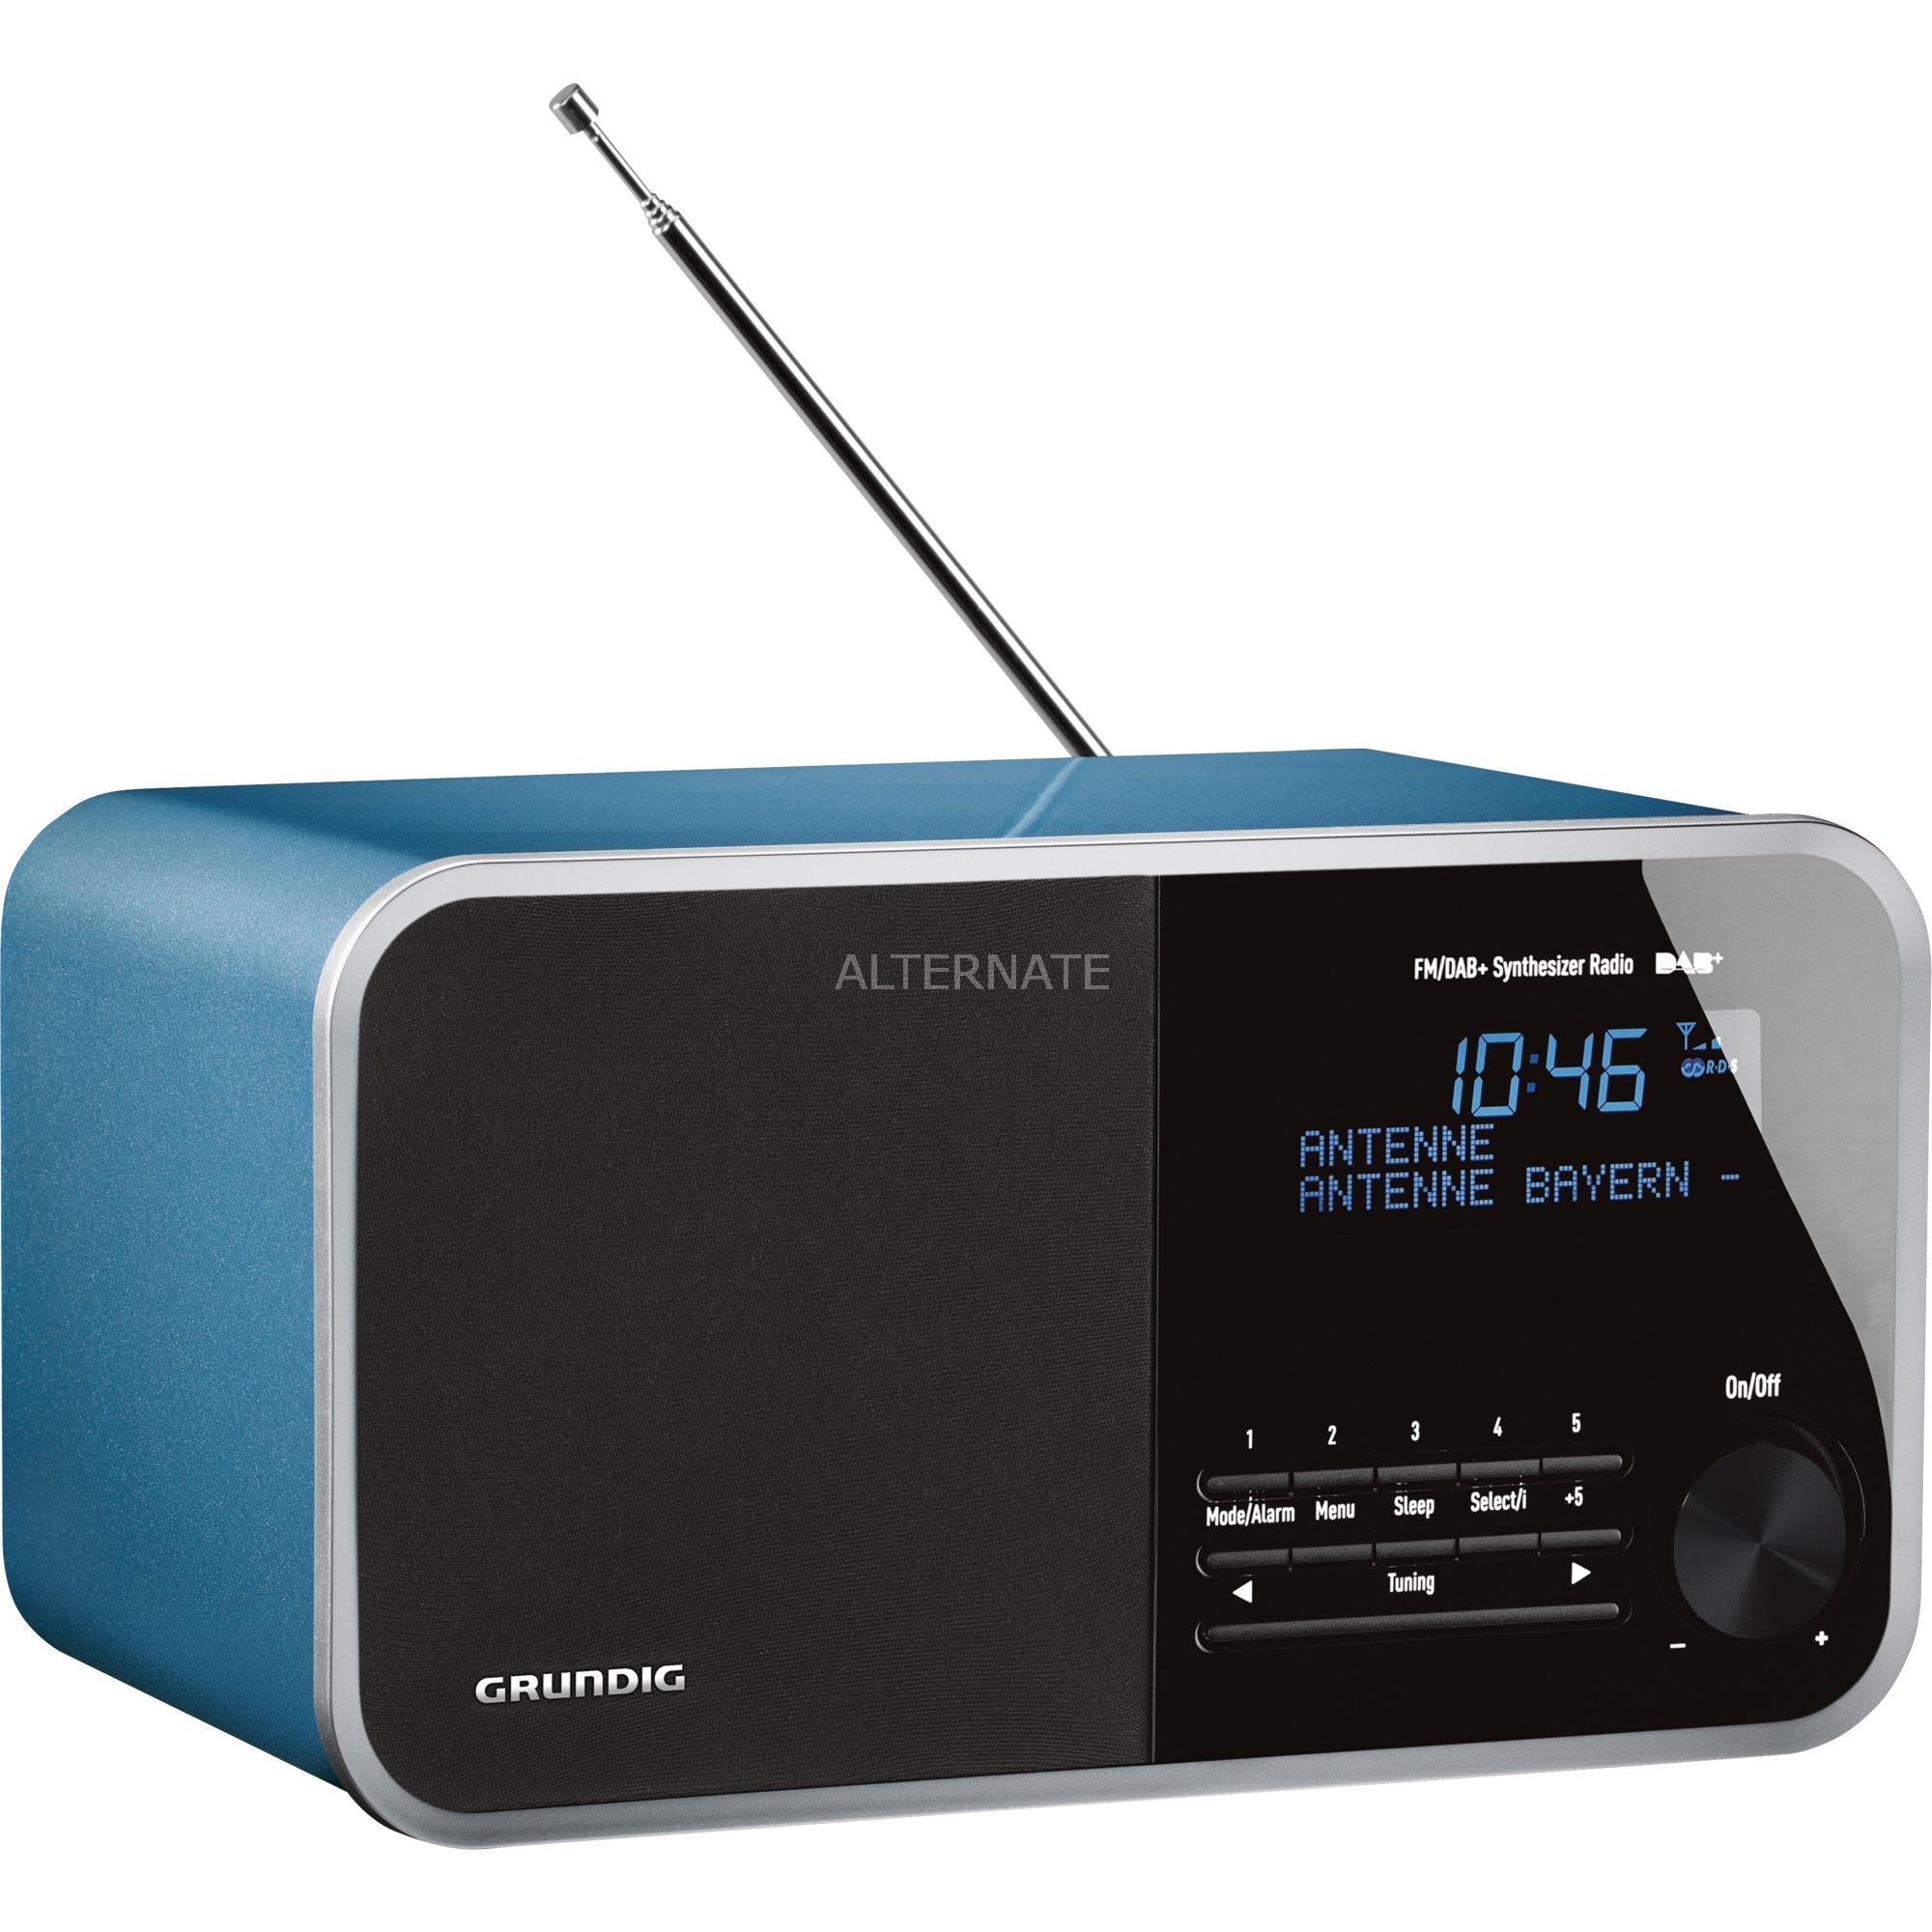 DTR 3000 DAB+ radio Personal Analógico y digital Azul